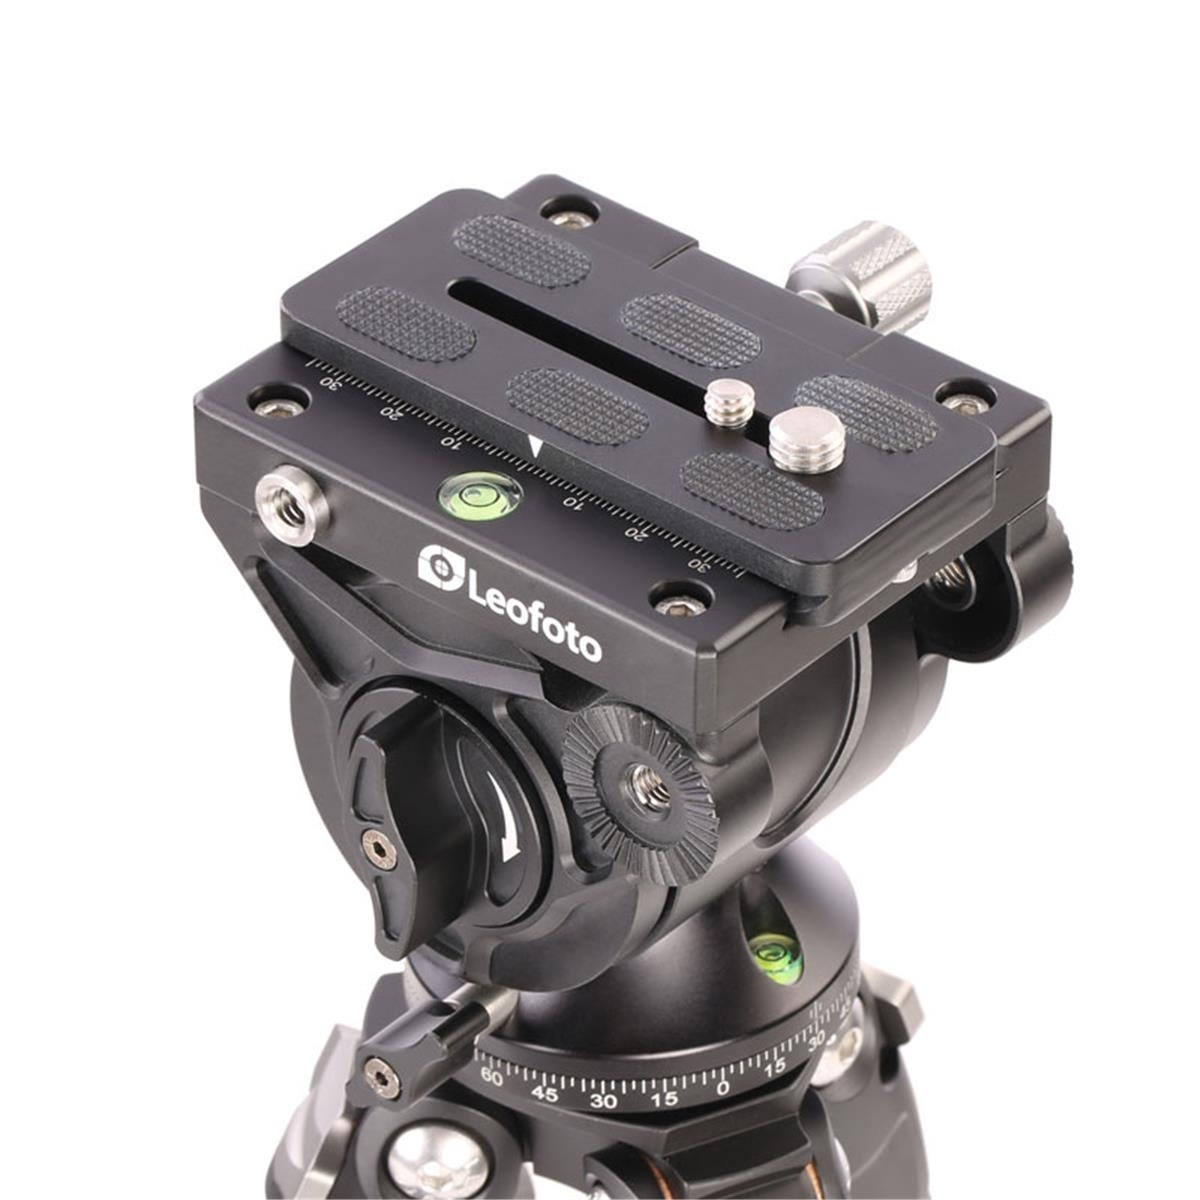 Leofoto Fluid Video Kopf BV-10